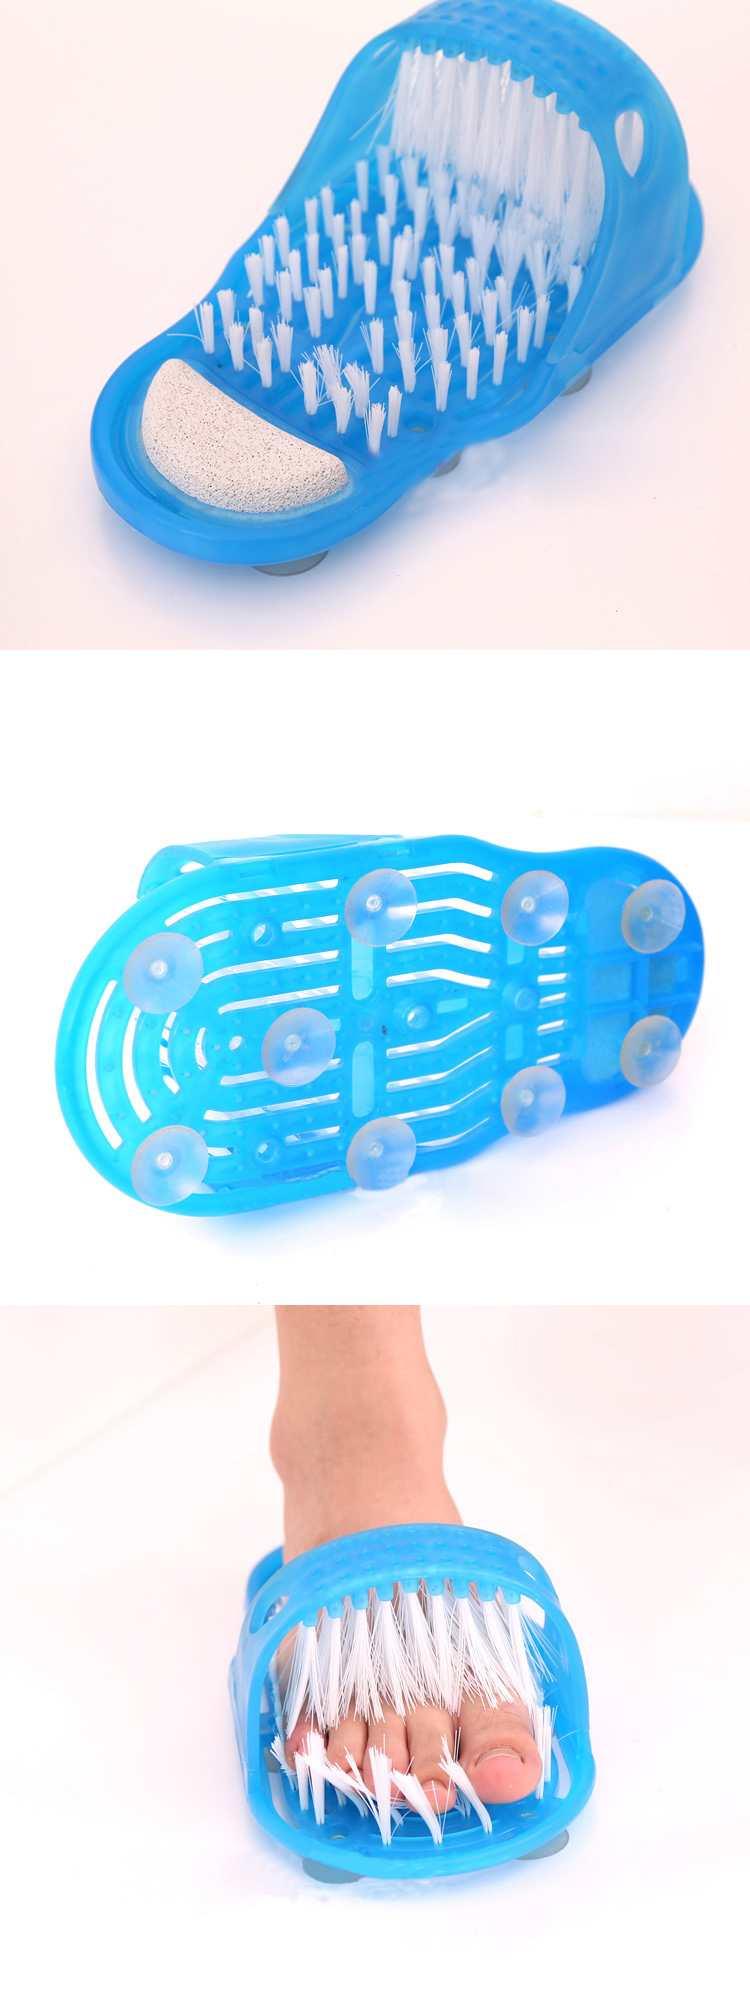 Anti-slip Duche Pés Scrubber Massager Escova Limpa Banho Exfoliates Shoes 6259 7 EWyKg